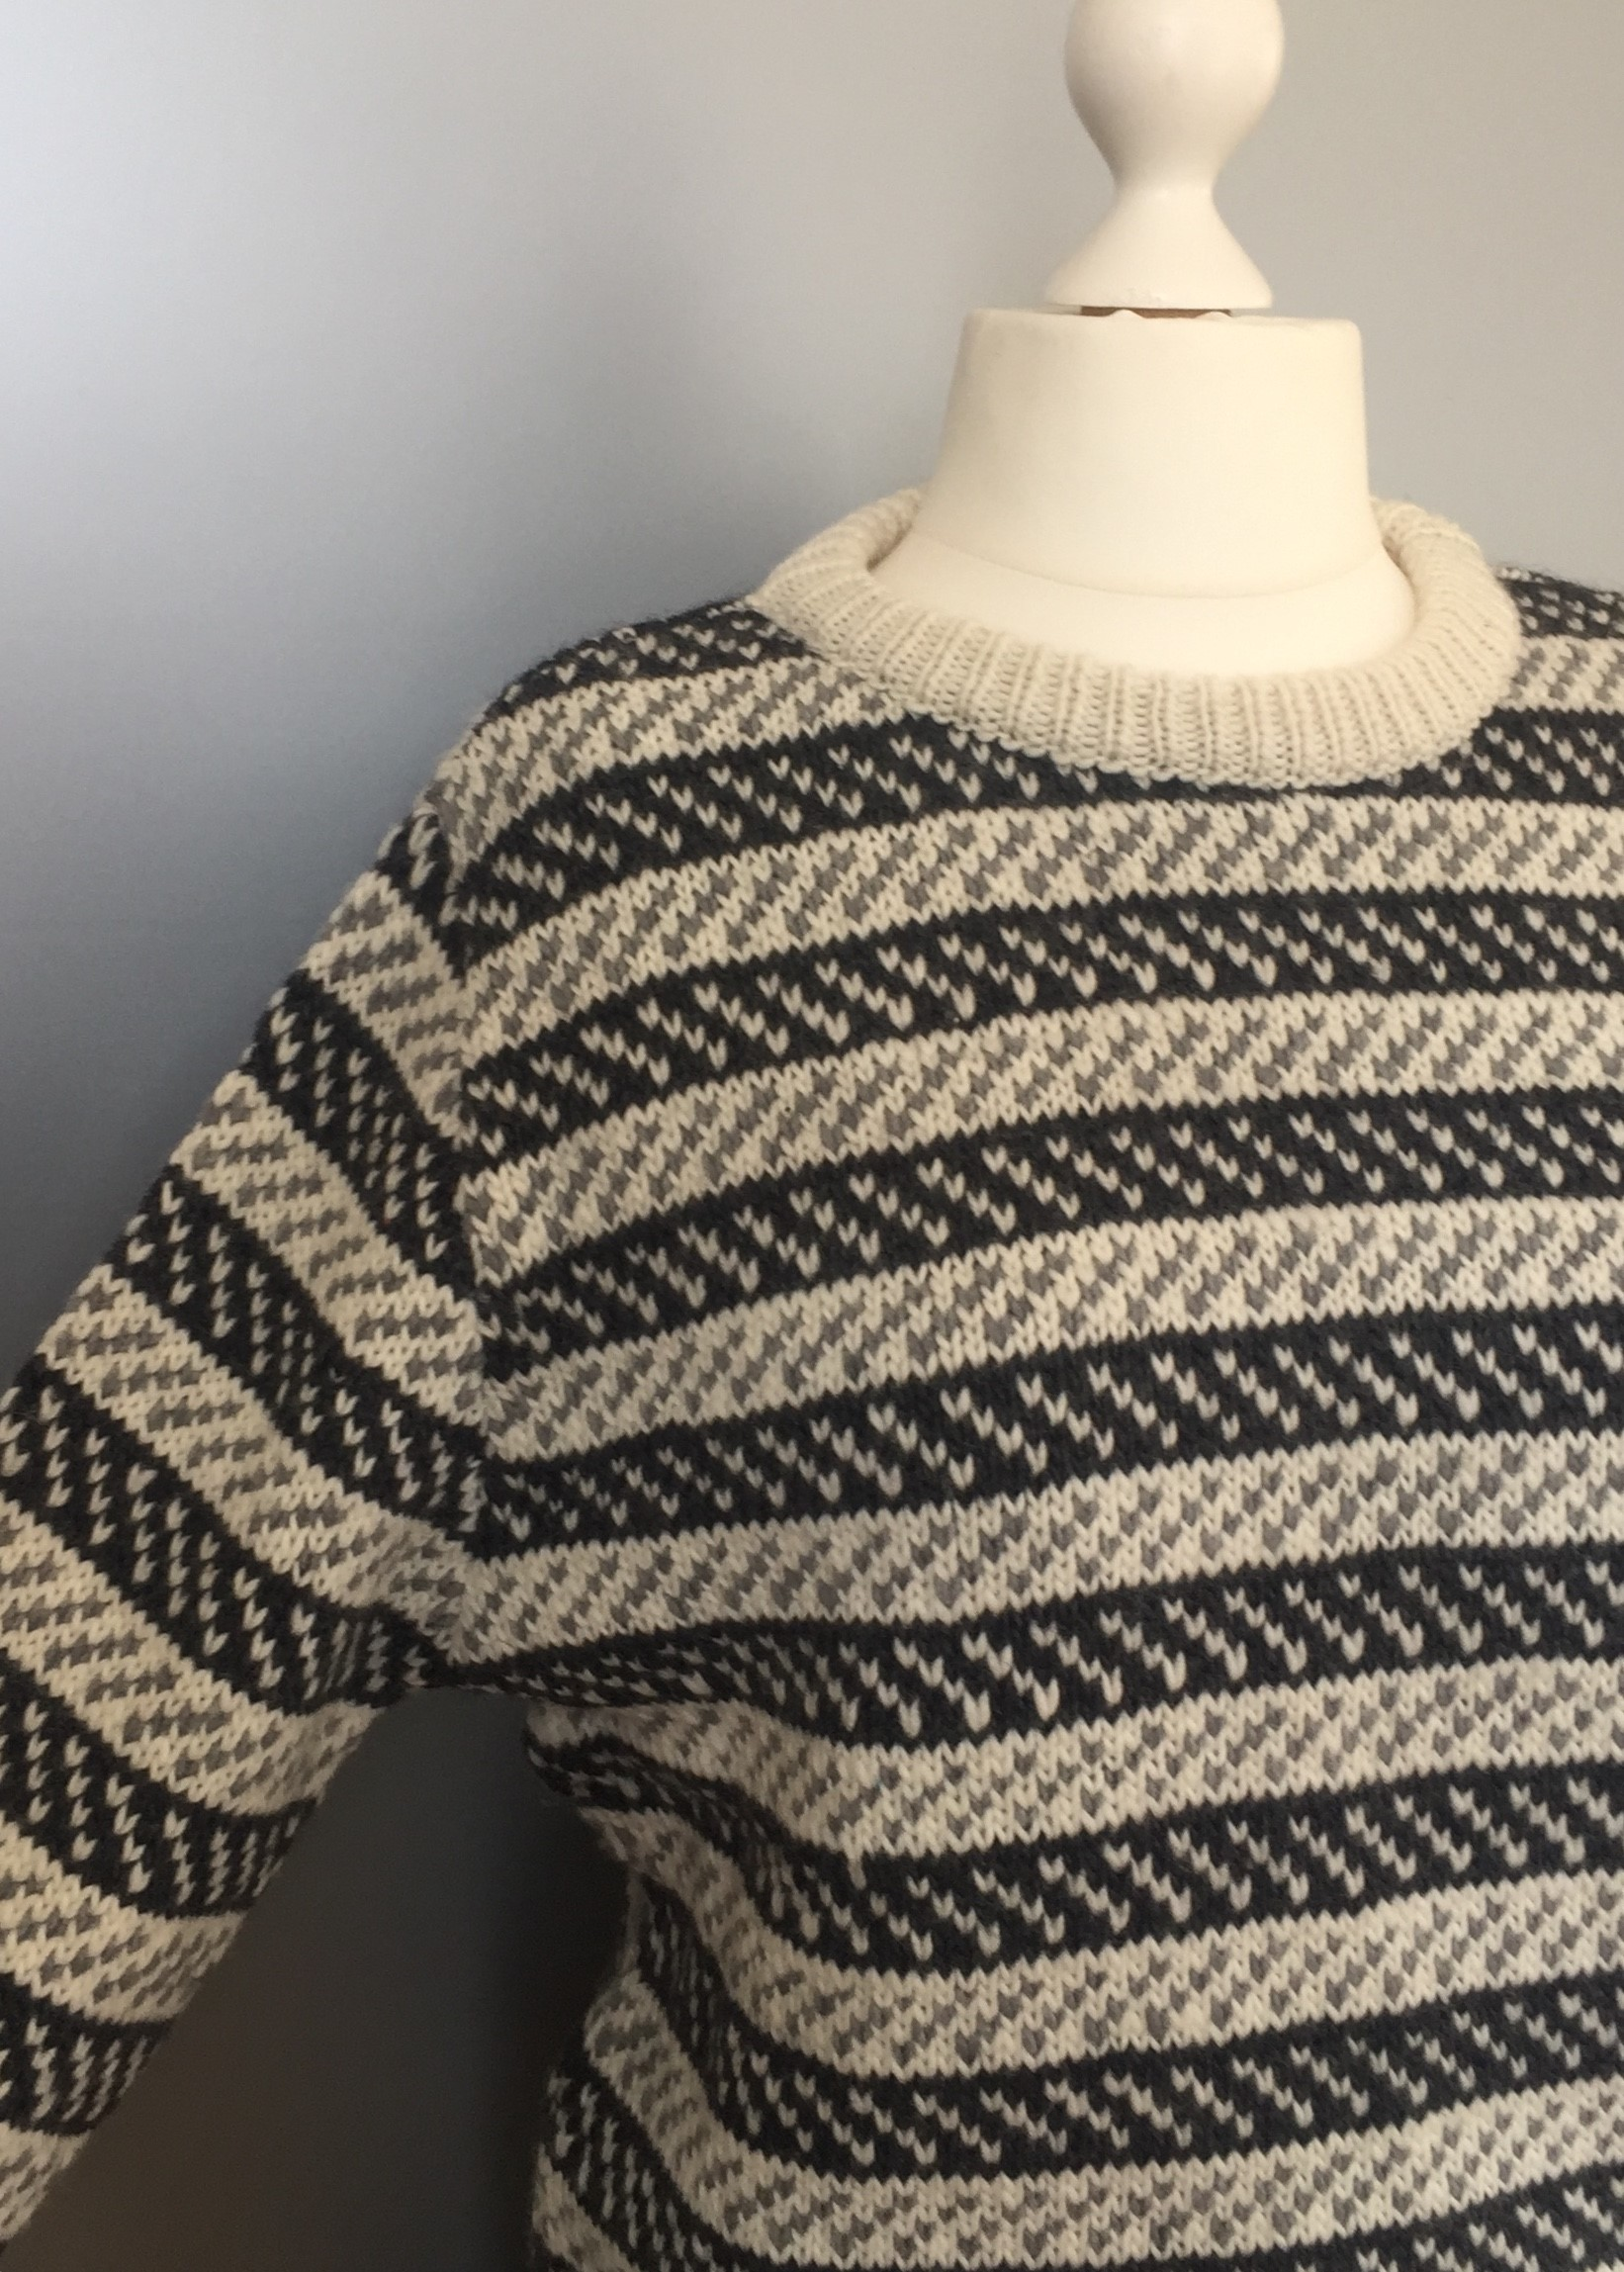 Fuza - merinould - Dane Pullover koks/natur, hipster, klassisk, unisex, oversize, herrepullover, herrestrik, sweater, uldsweater, islænder, dansk, damestrik, uldsweater, uldtrøje, pullover, traditionel, tyk, blød, merinould, biti, ribe